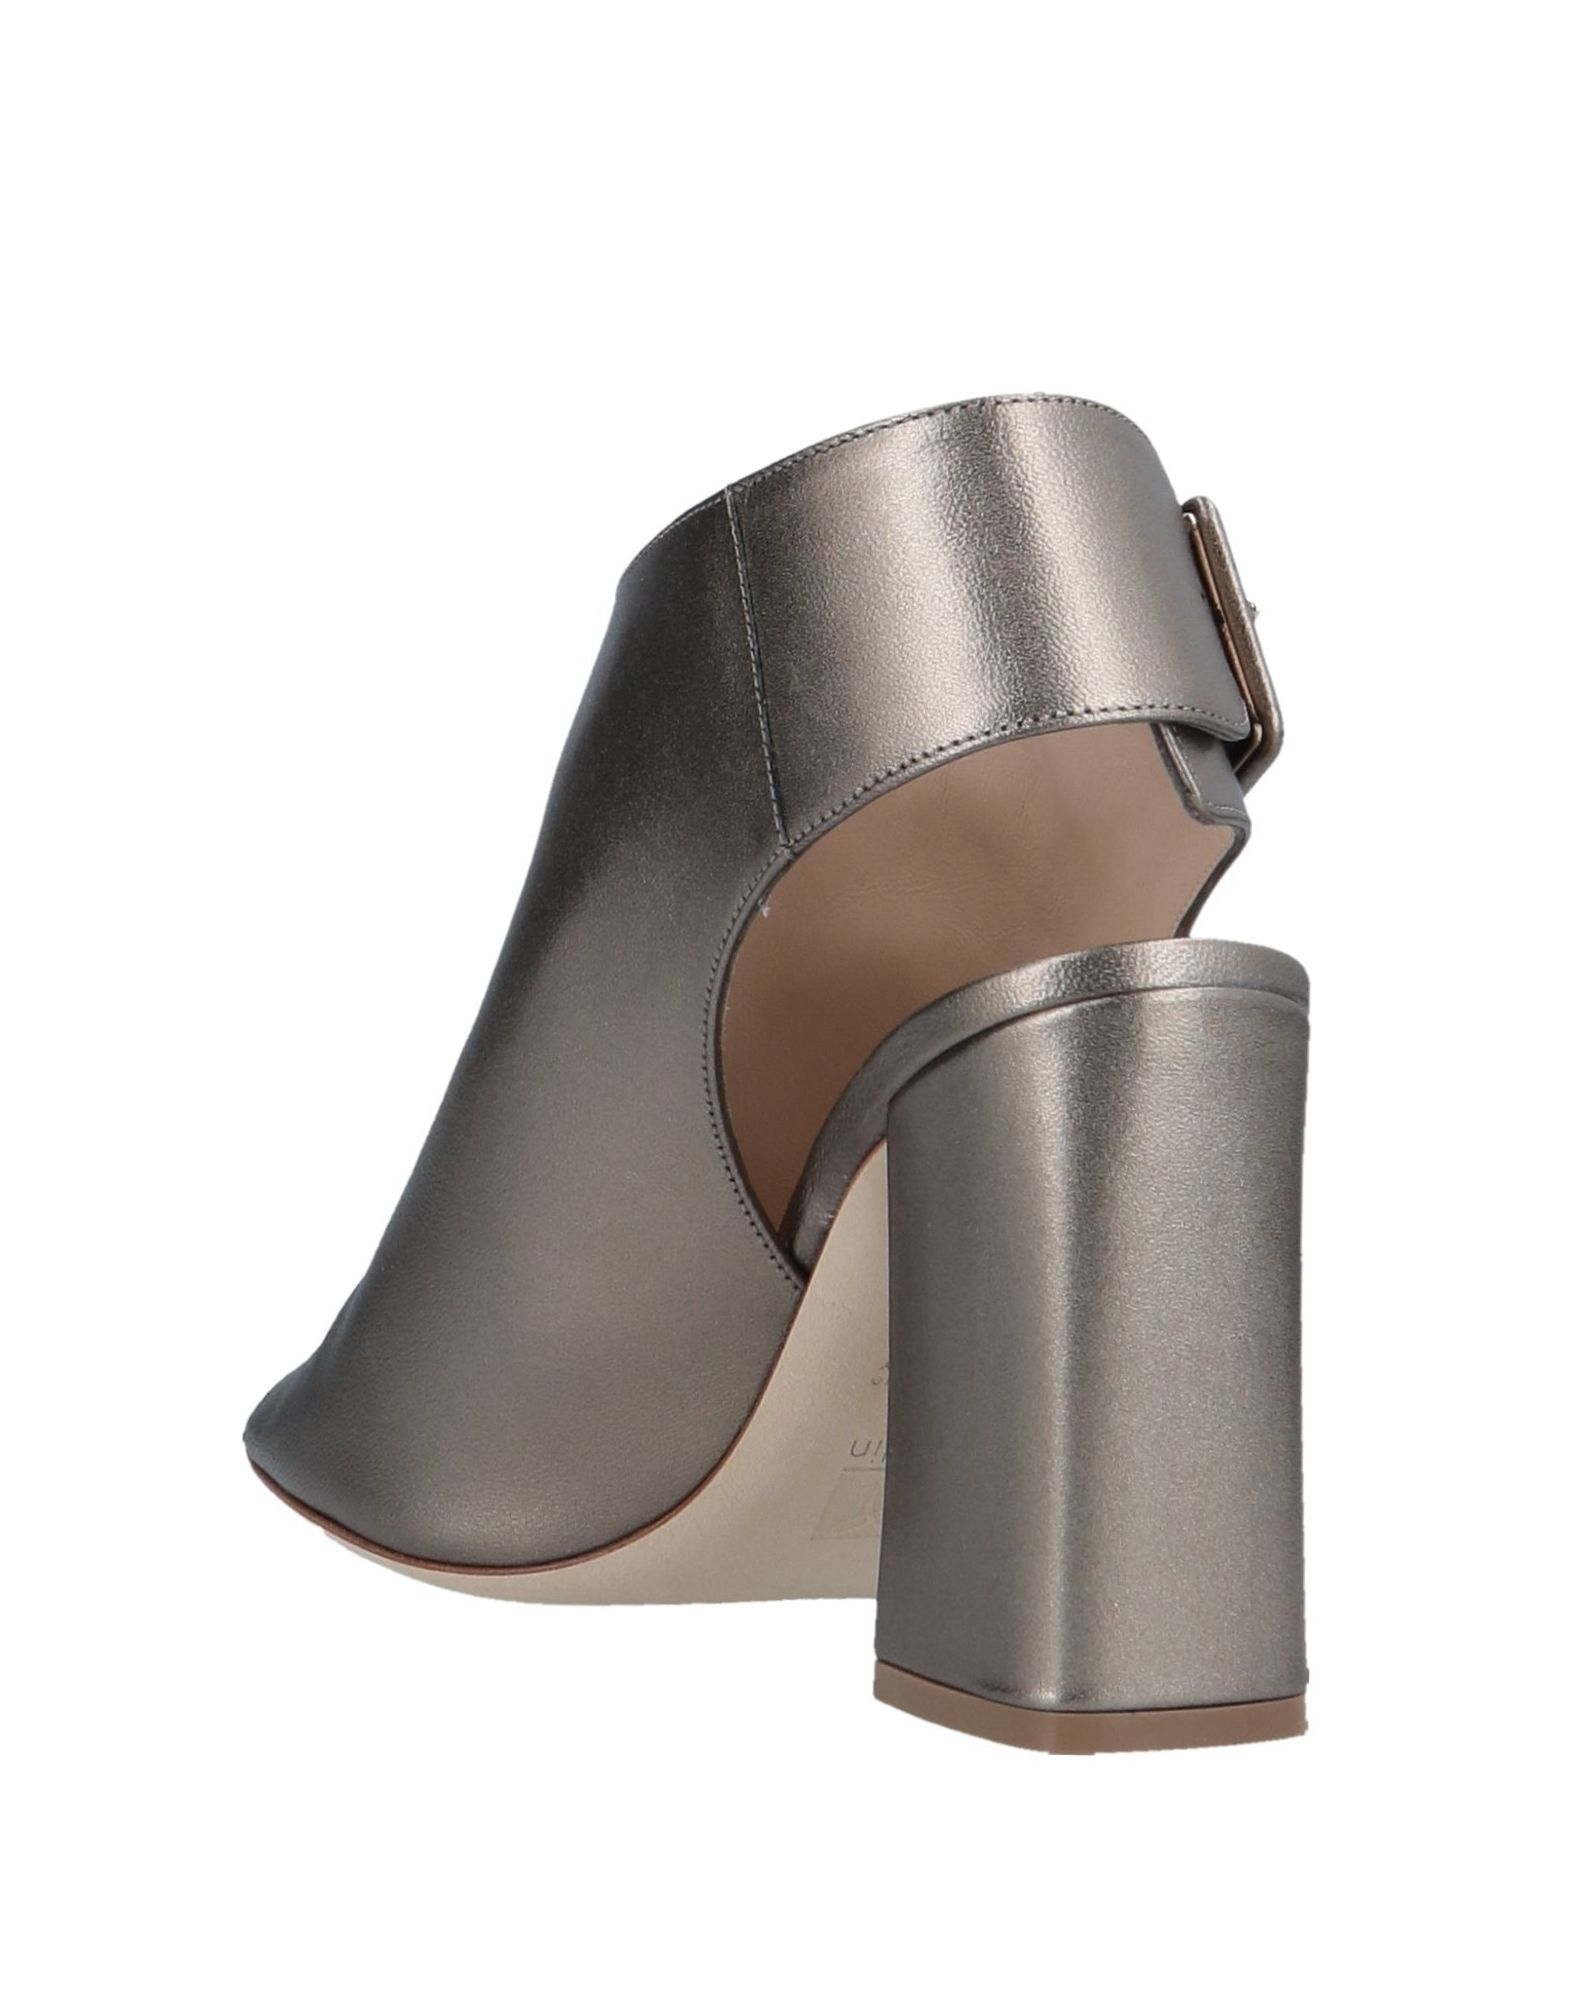 Rabatt Schuhe Sandalen Ballin Sandalen Schuhe Damen  11576225GG ee3dfe